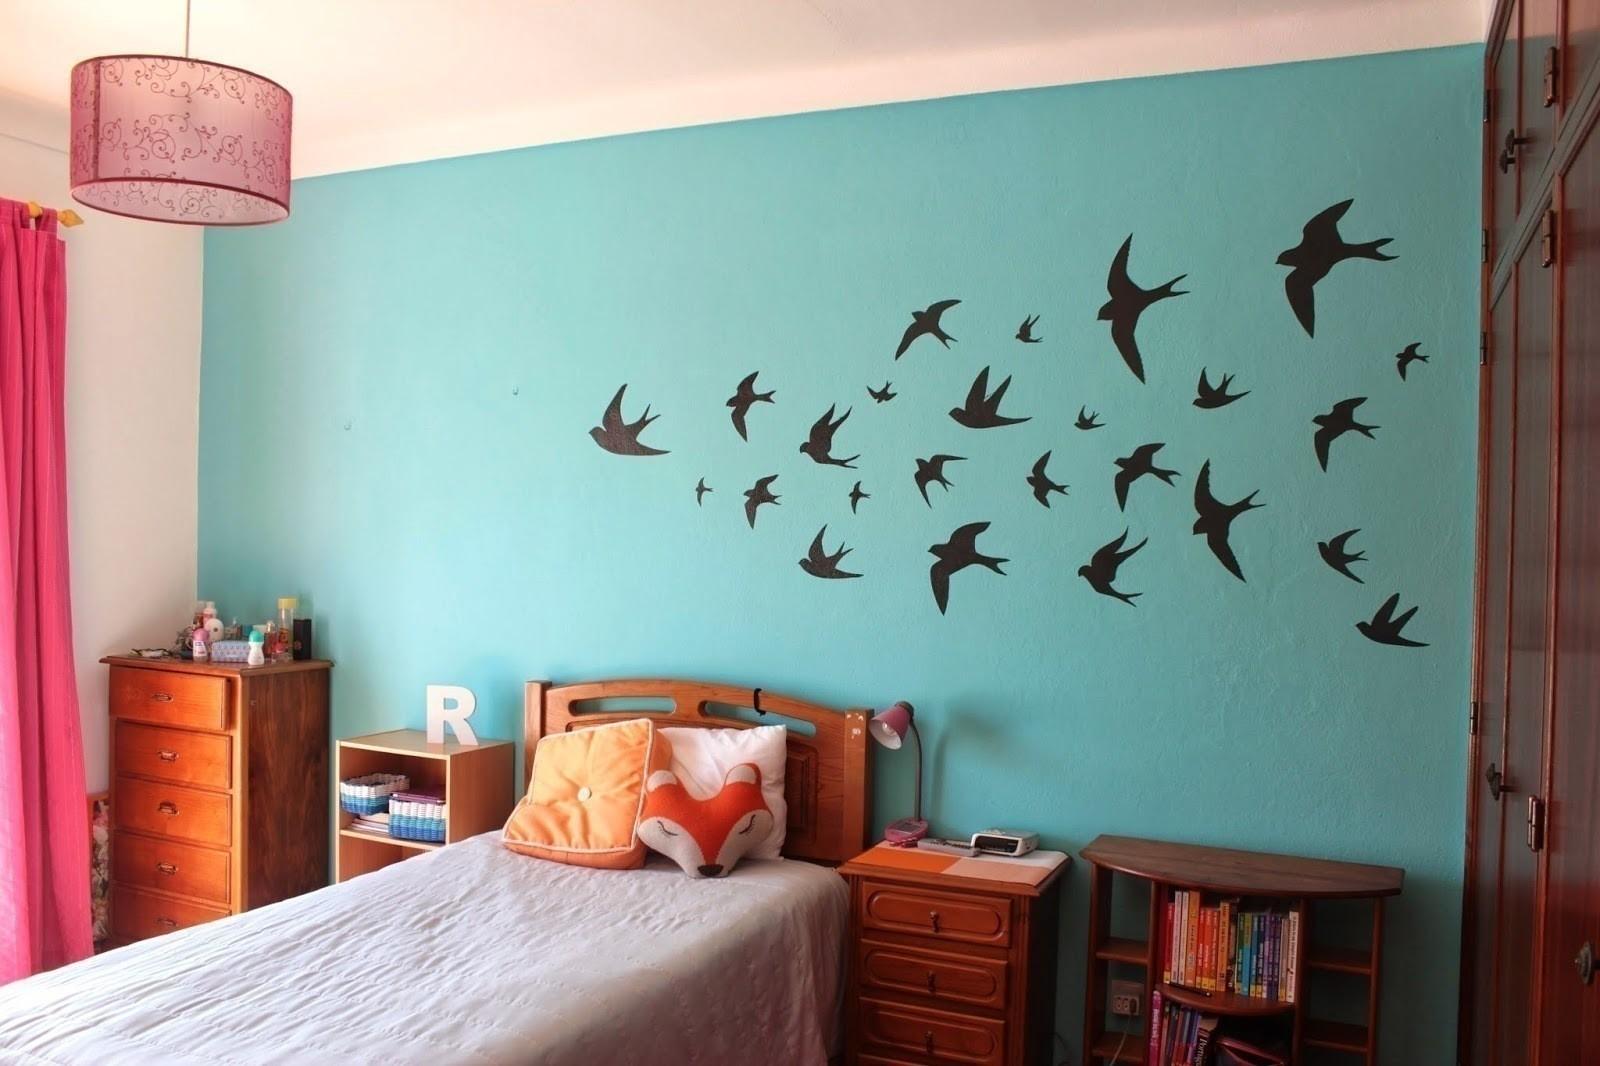 Swallows Wall Decor · How To Make Wallpaper / A Wall